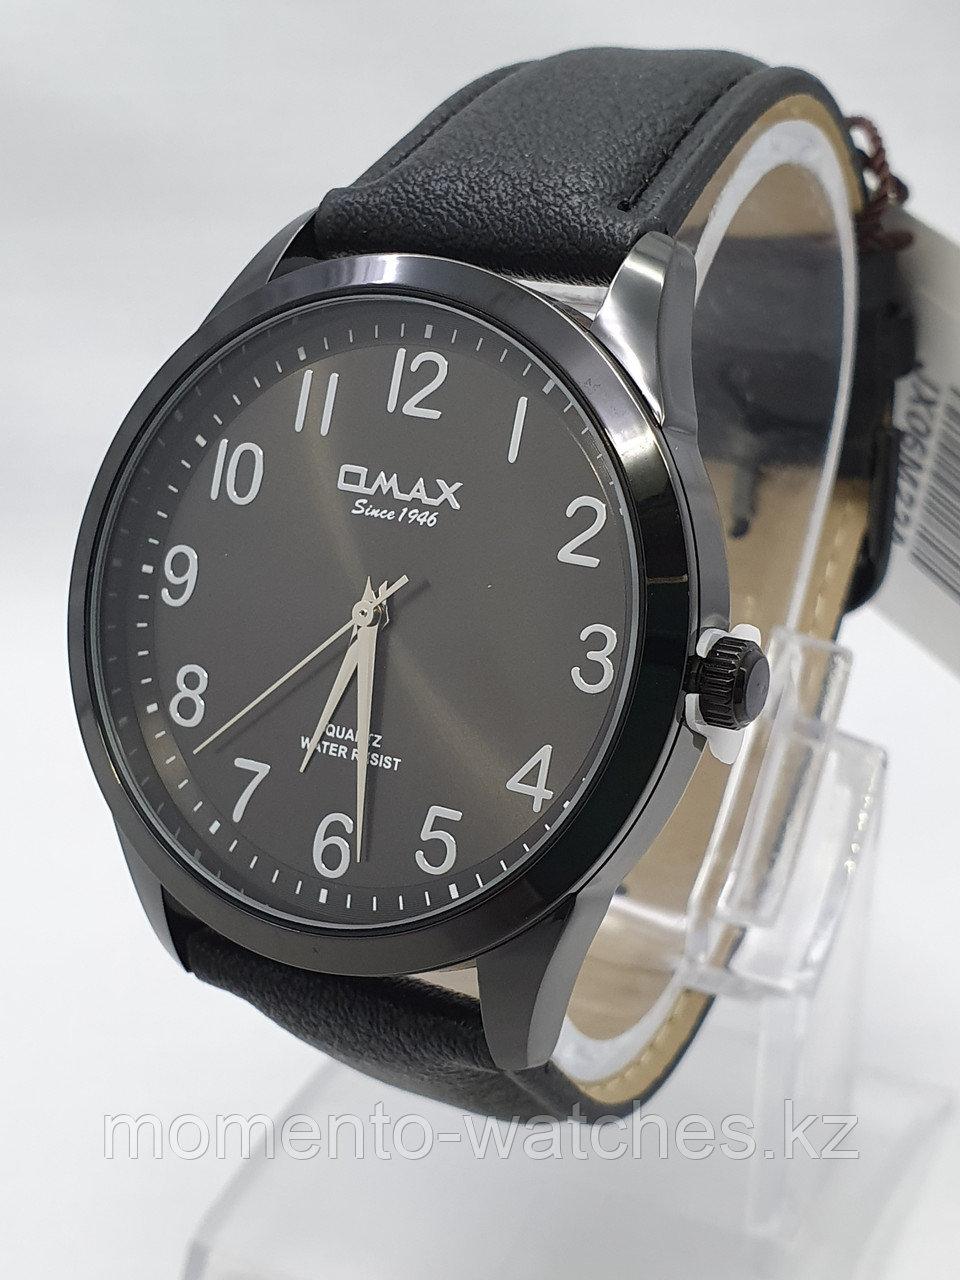 Мужские часы Omax 3 ВИДА